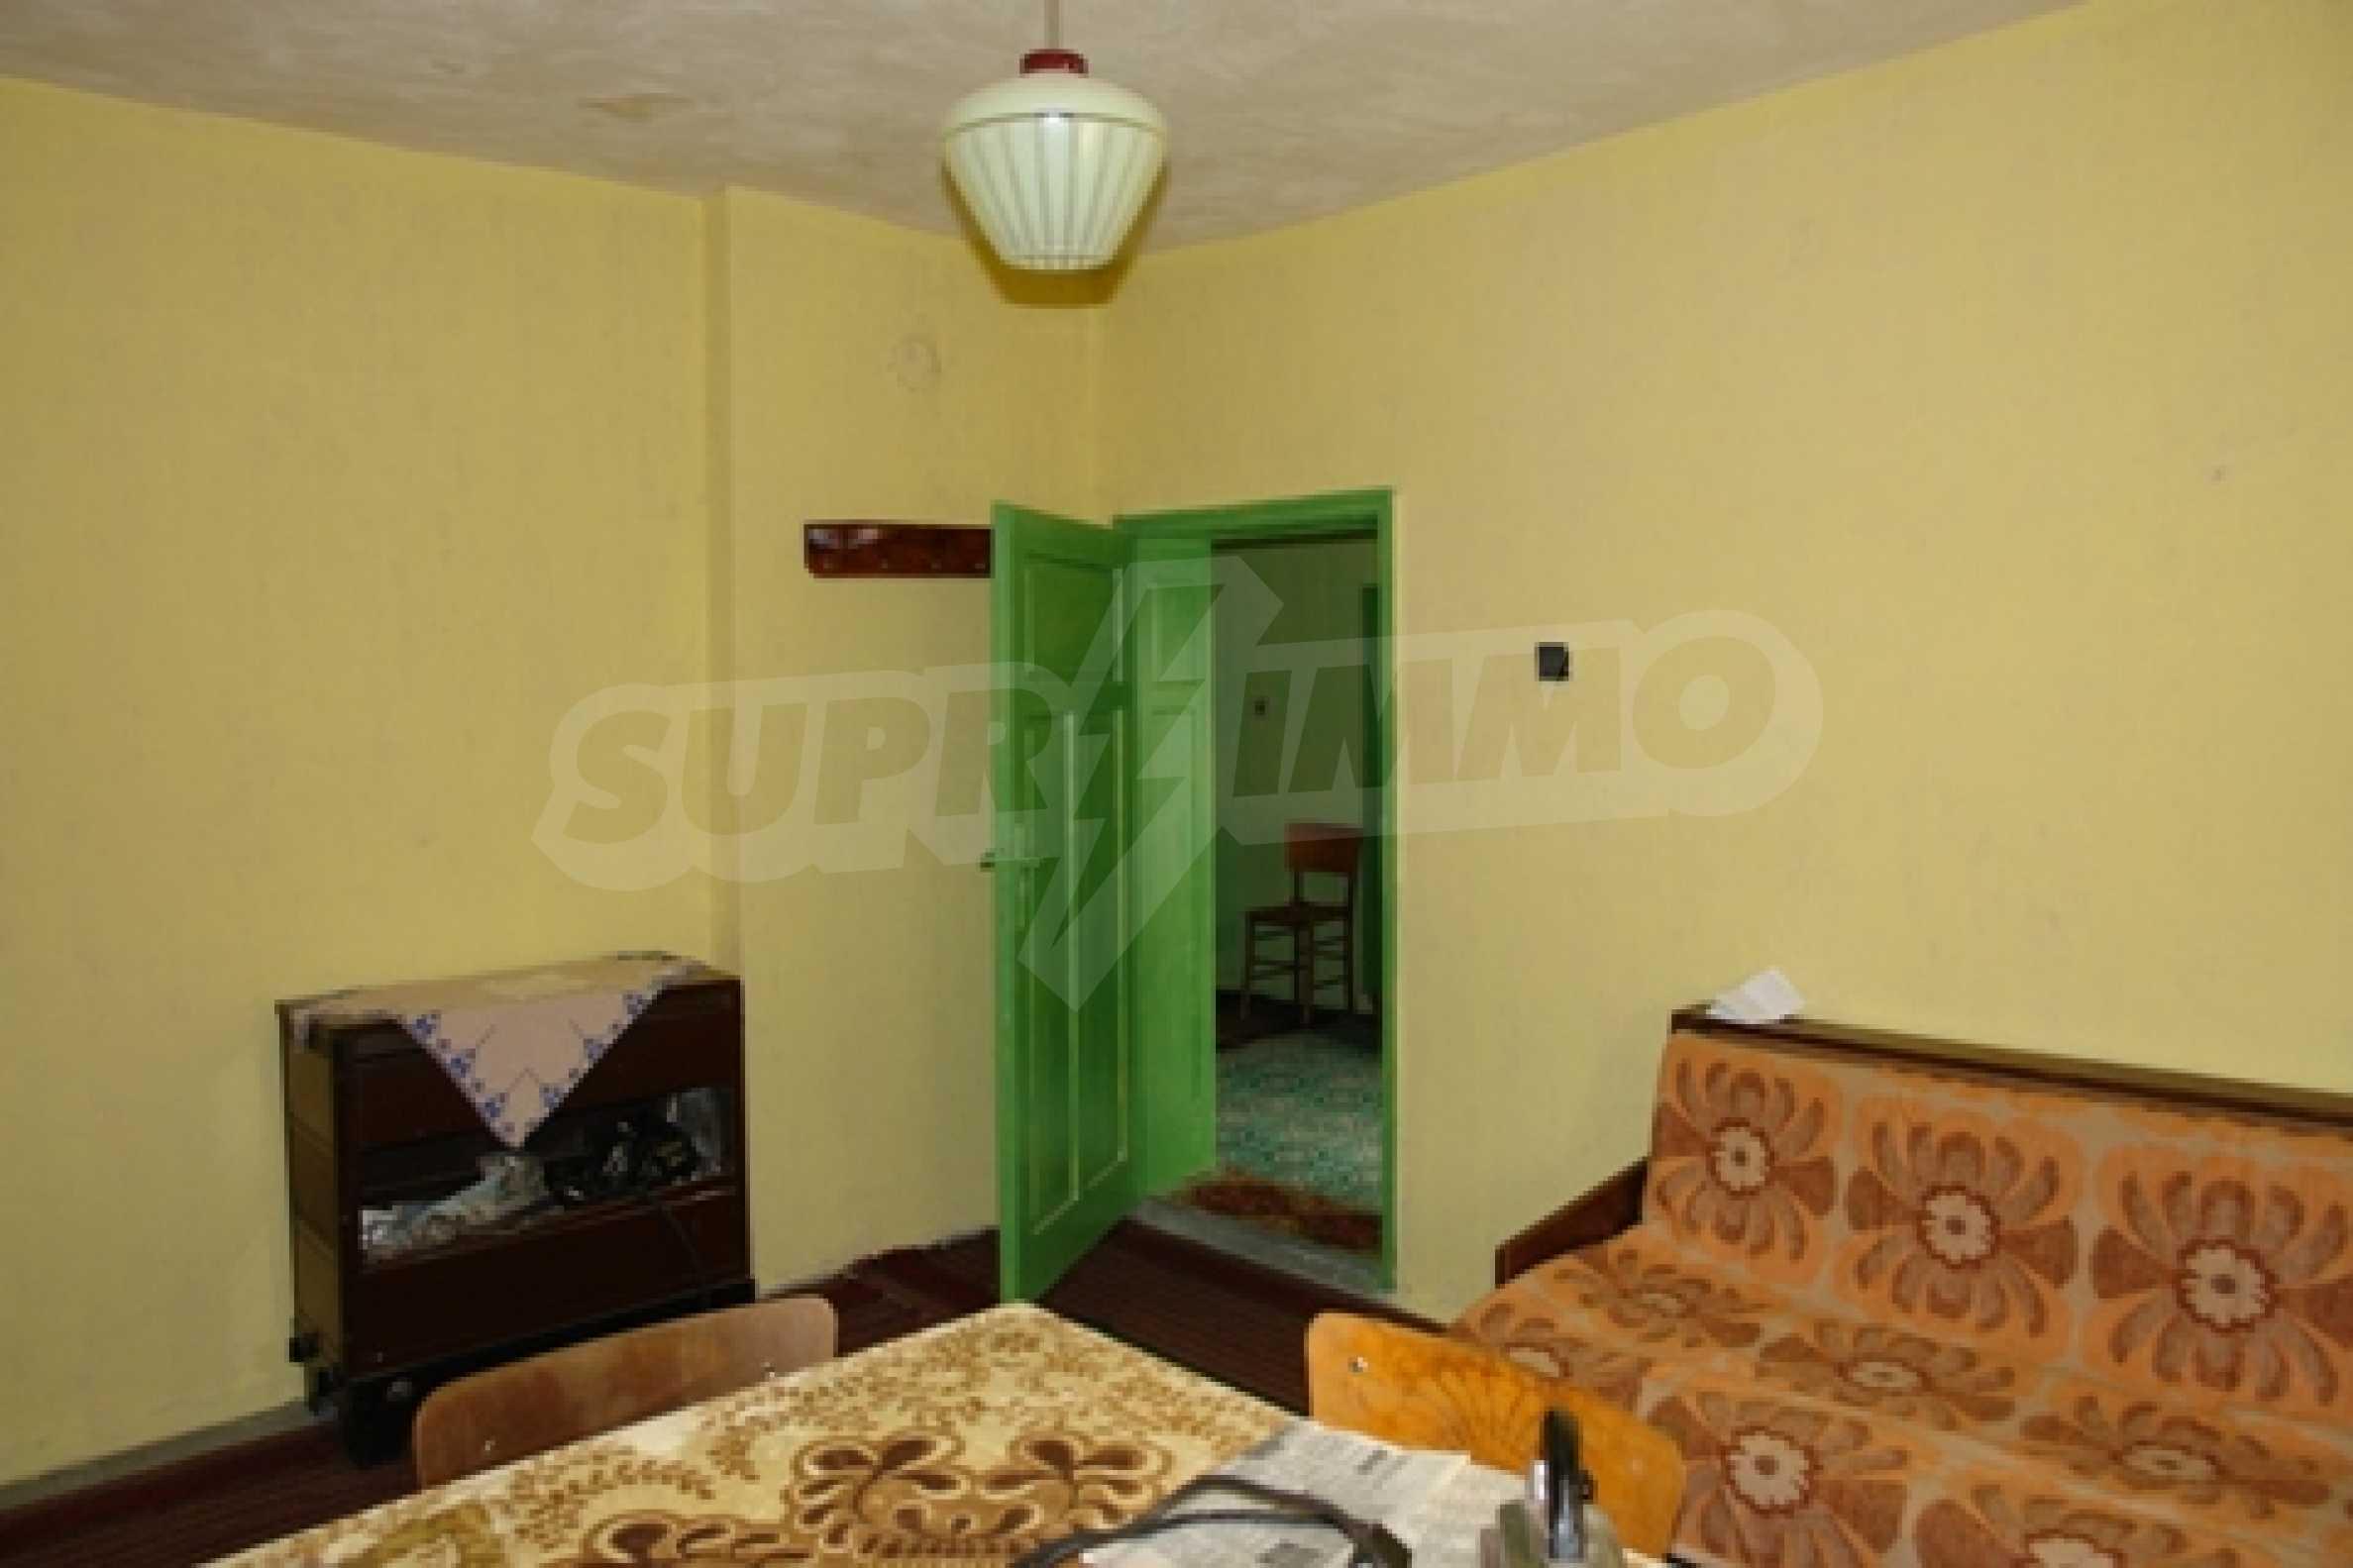 Spacious two-storey 4-bedroom house in Trastenik village, Ruse district 12